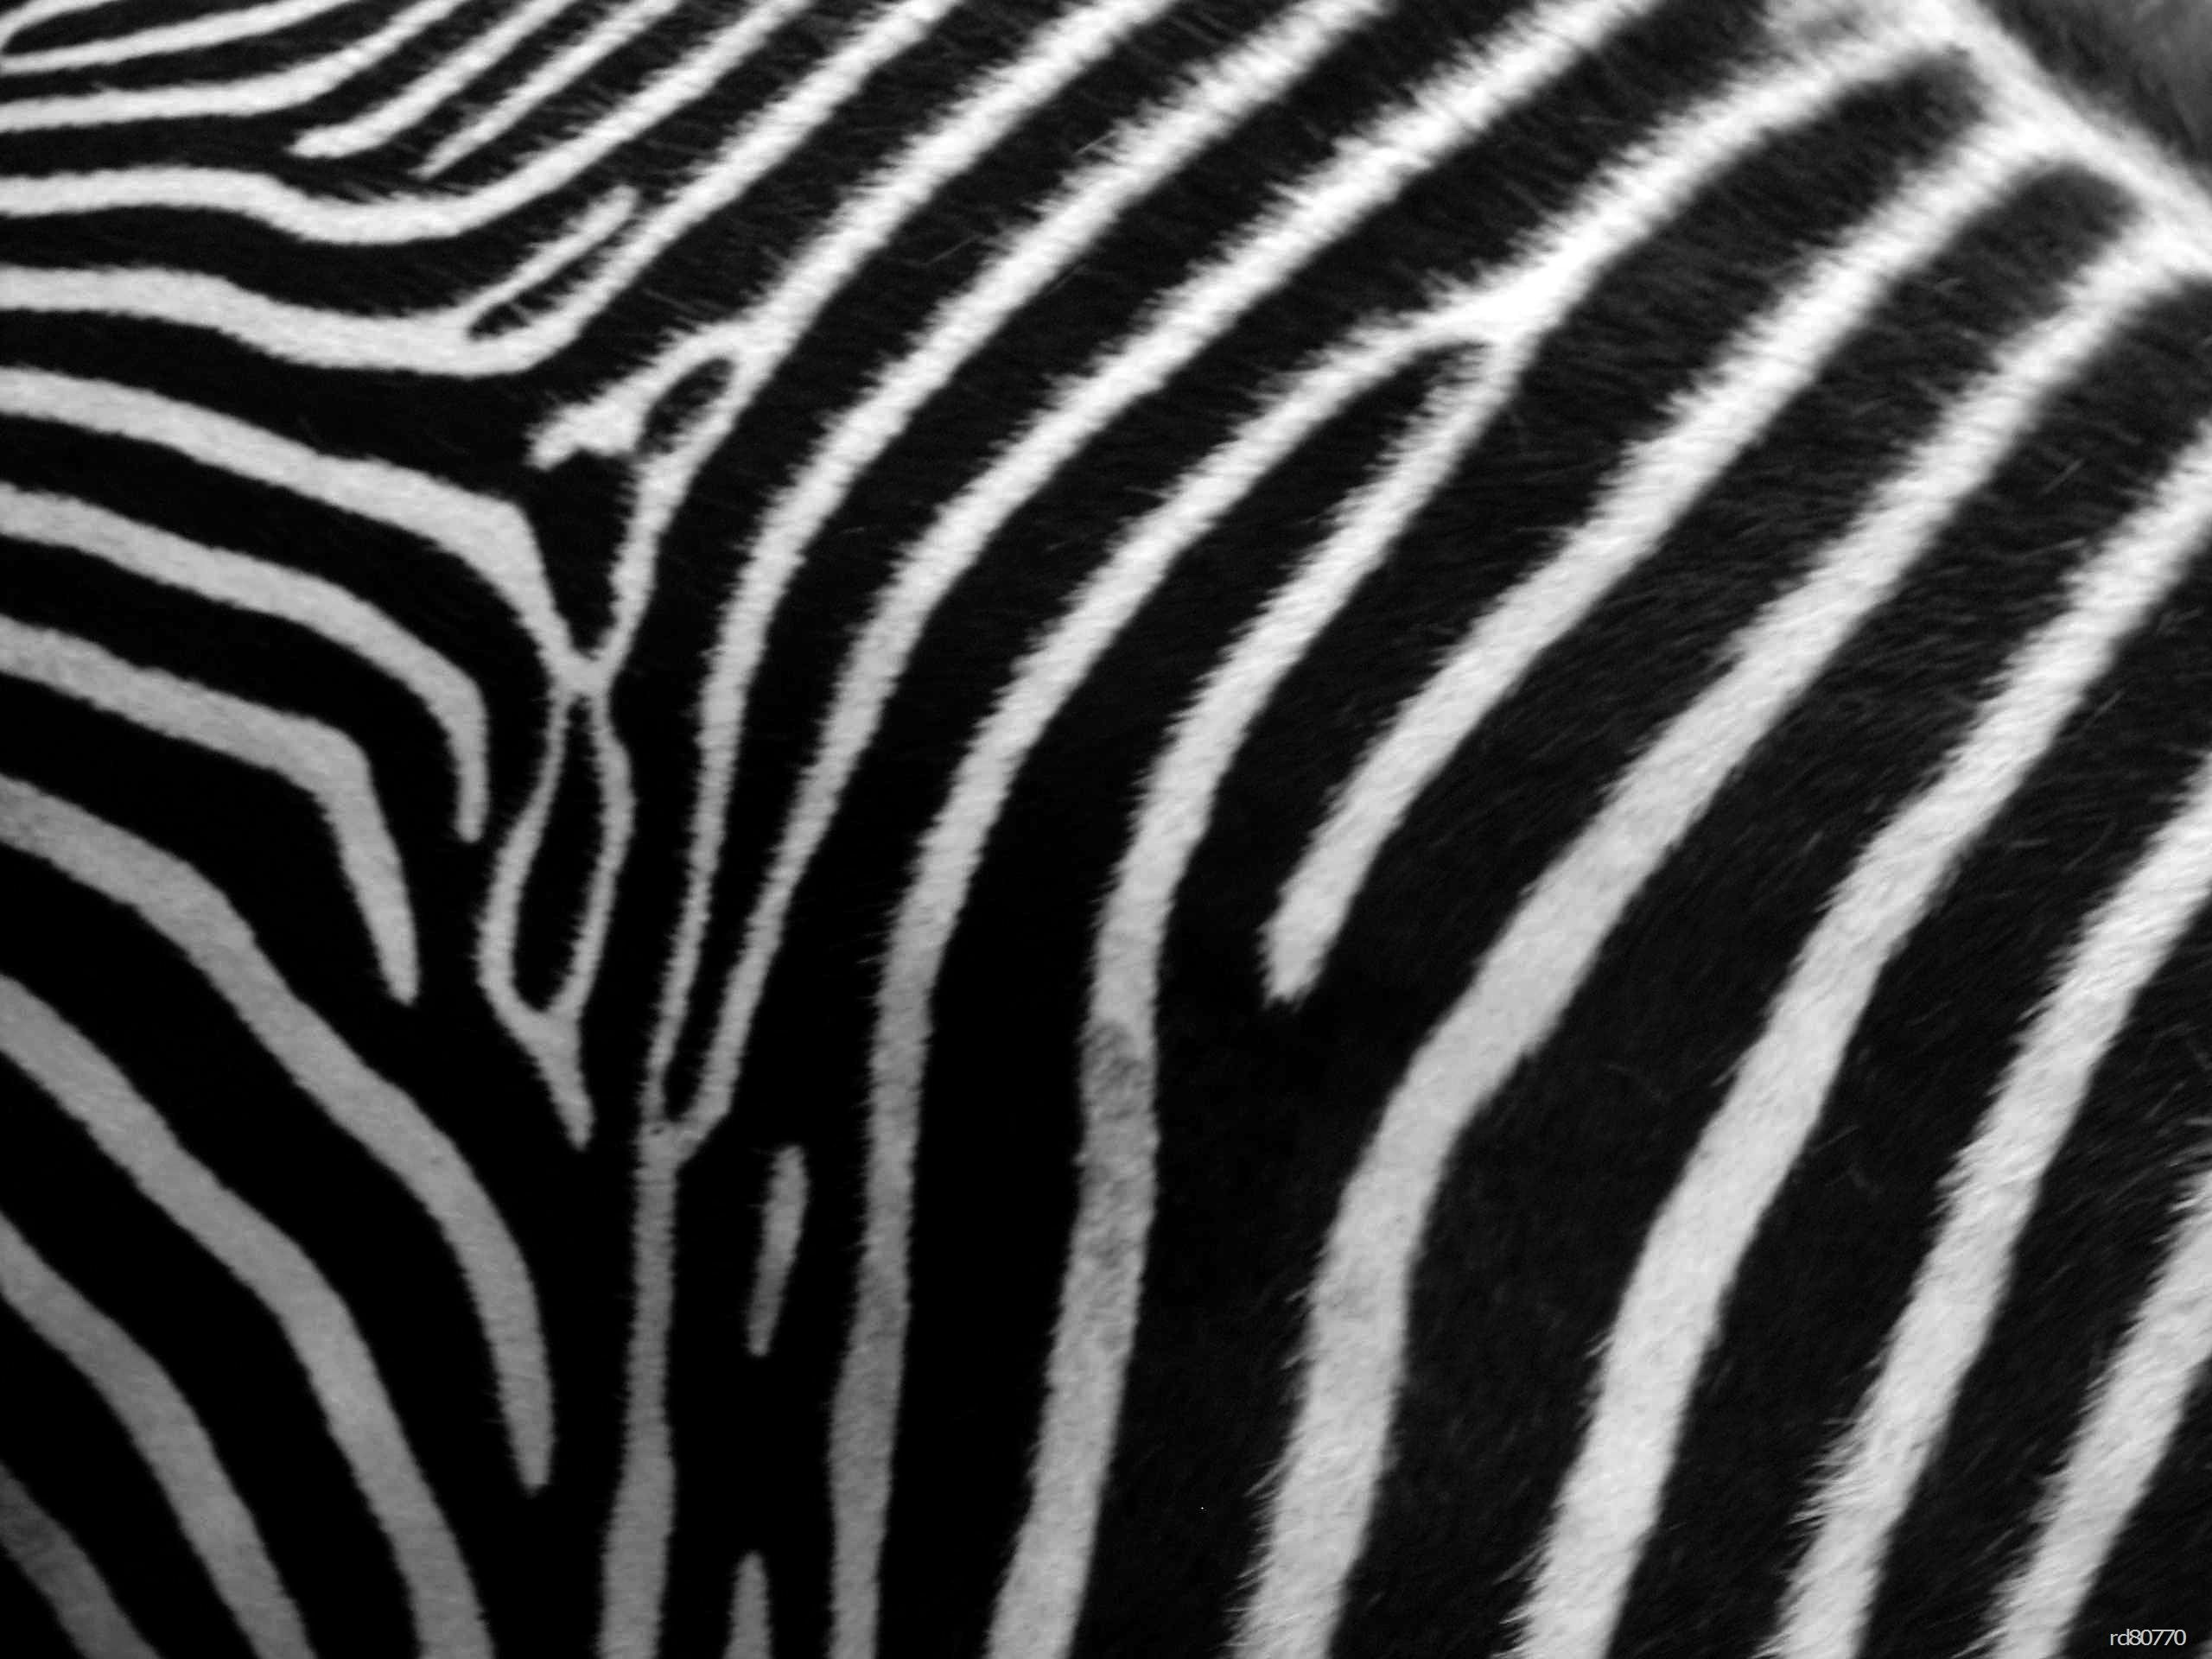 Zebra patterned wallpaper - Zebra Print Google